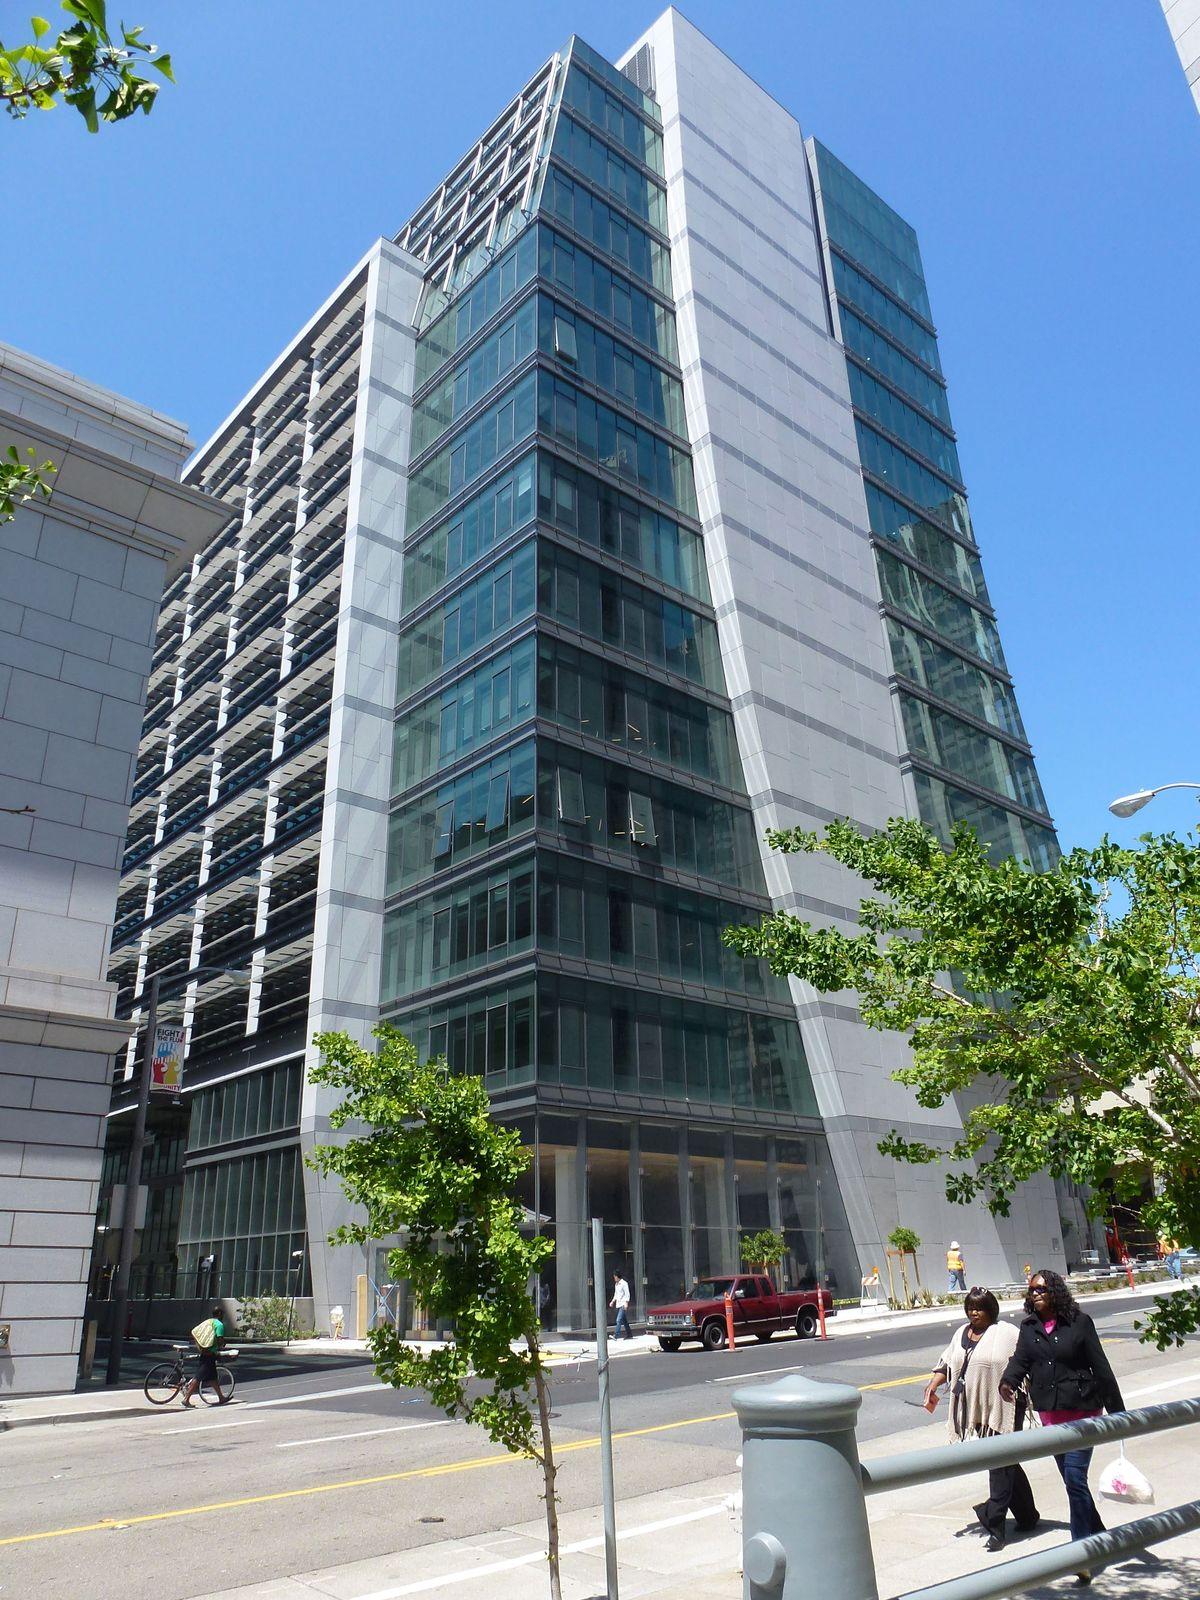 Sf public utilities commission building peter